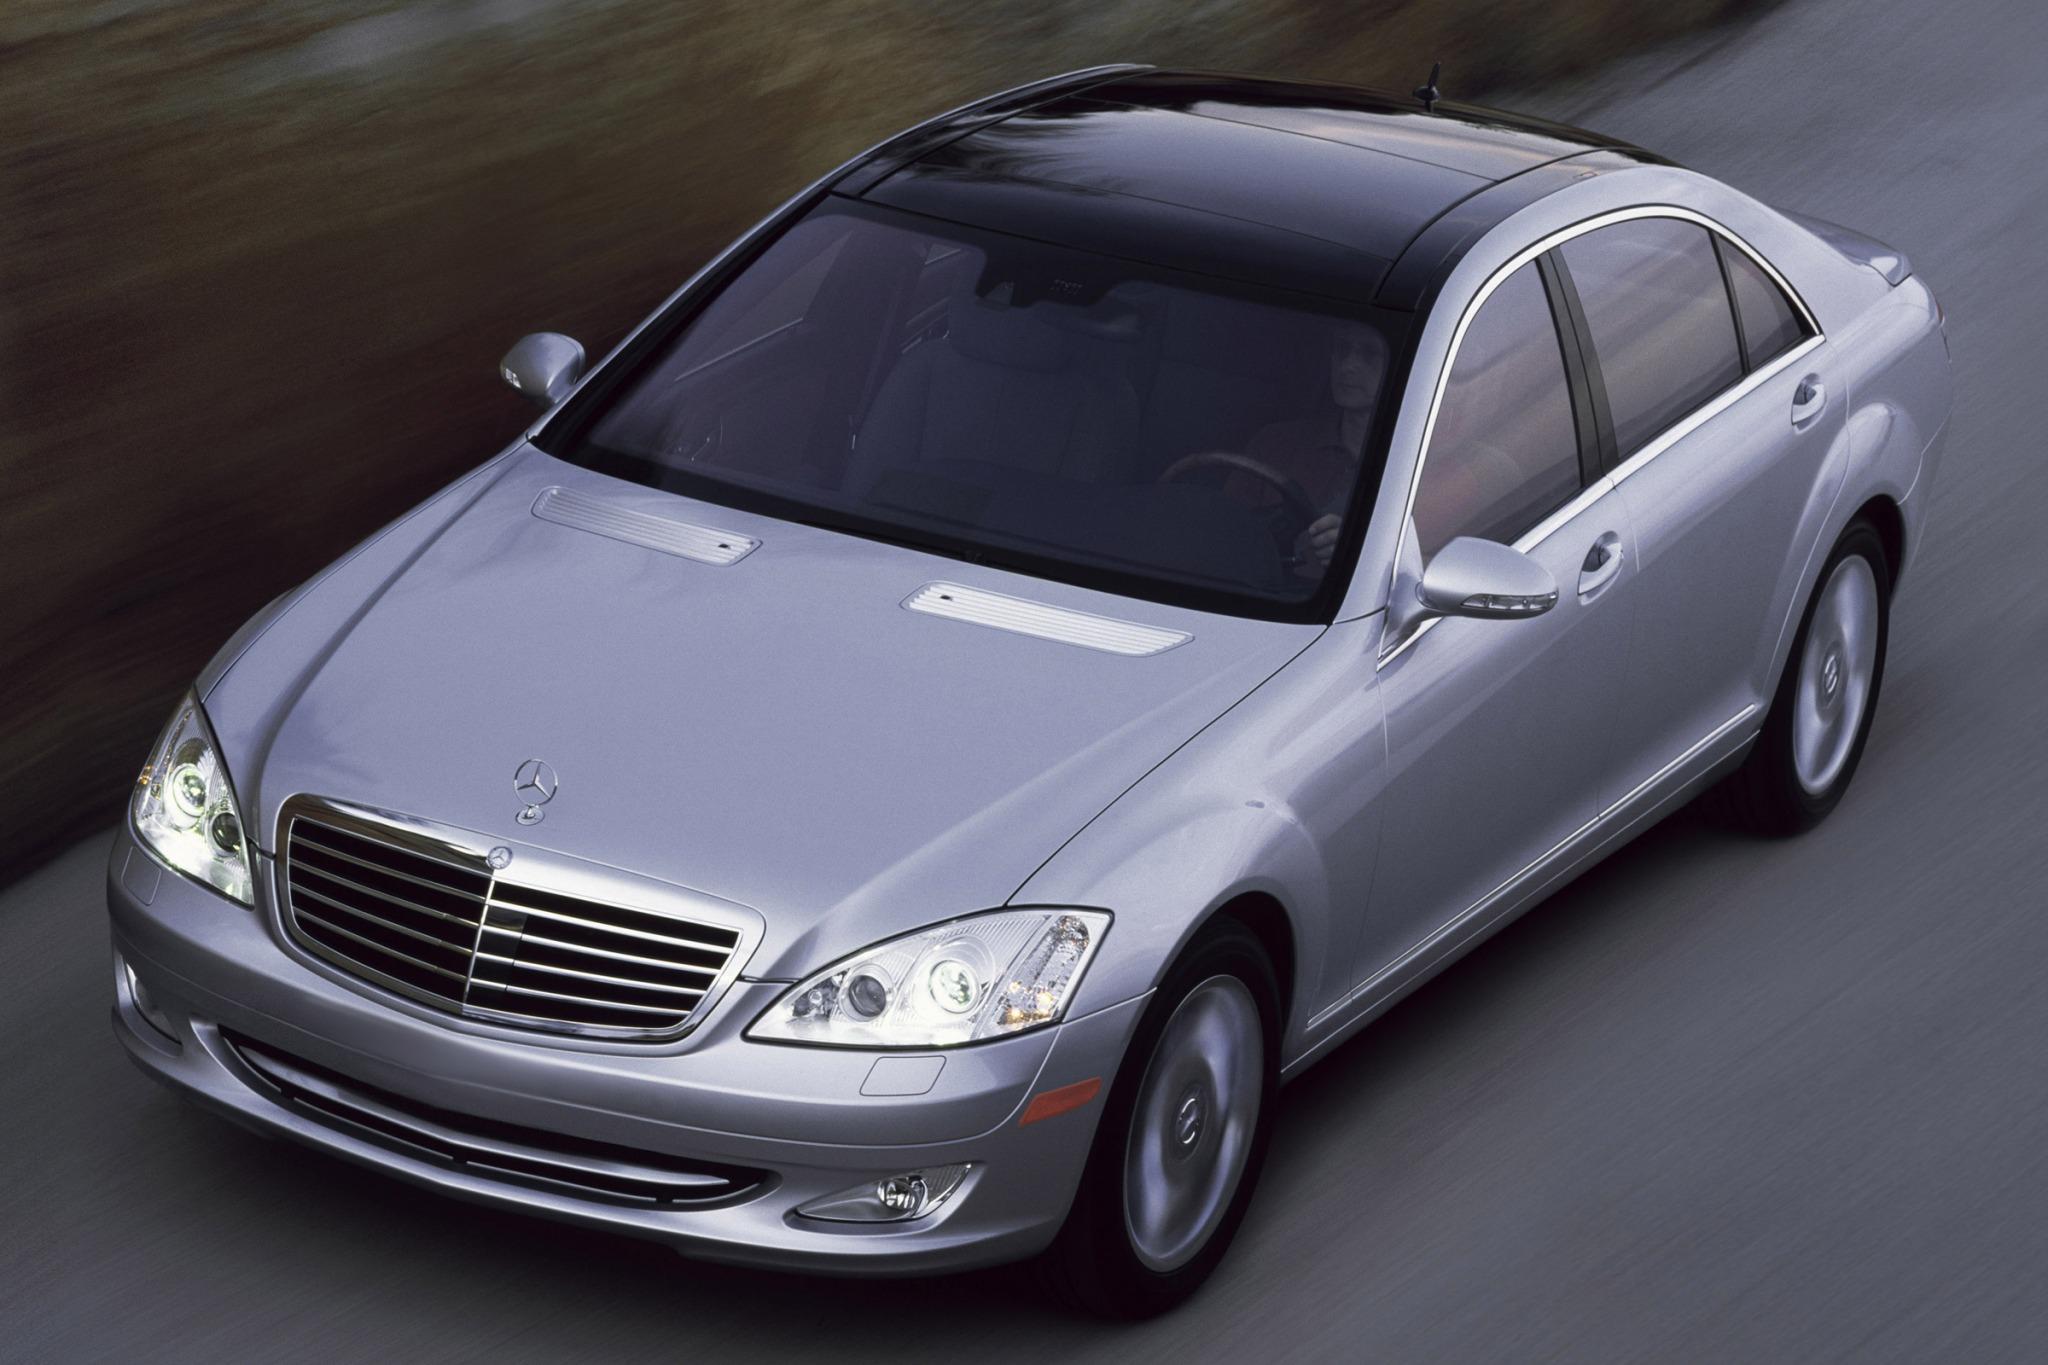 2007 mercedes benz s class sedan s550 fq oem 16 2048